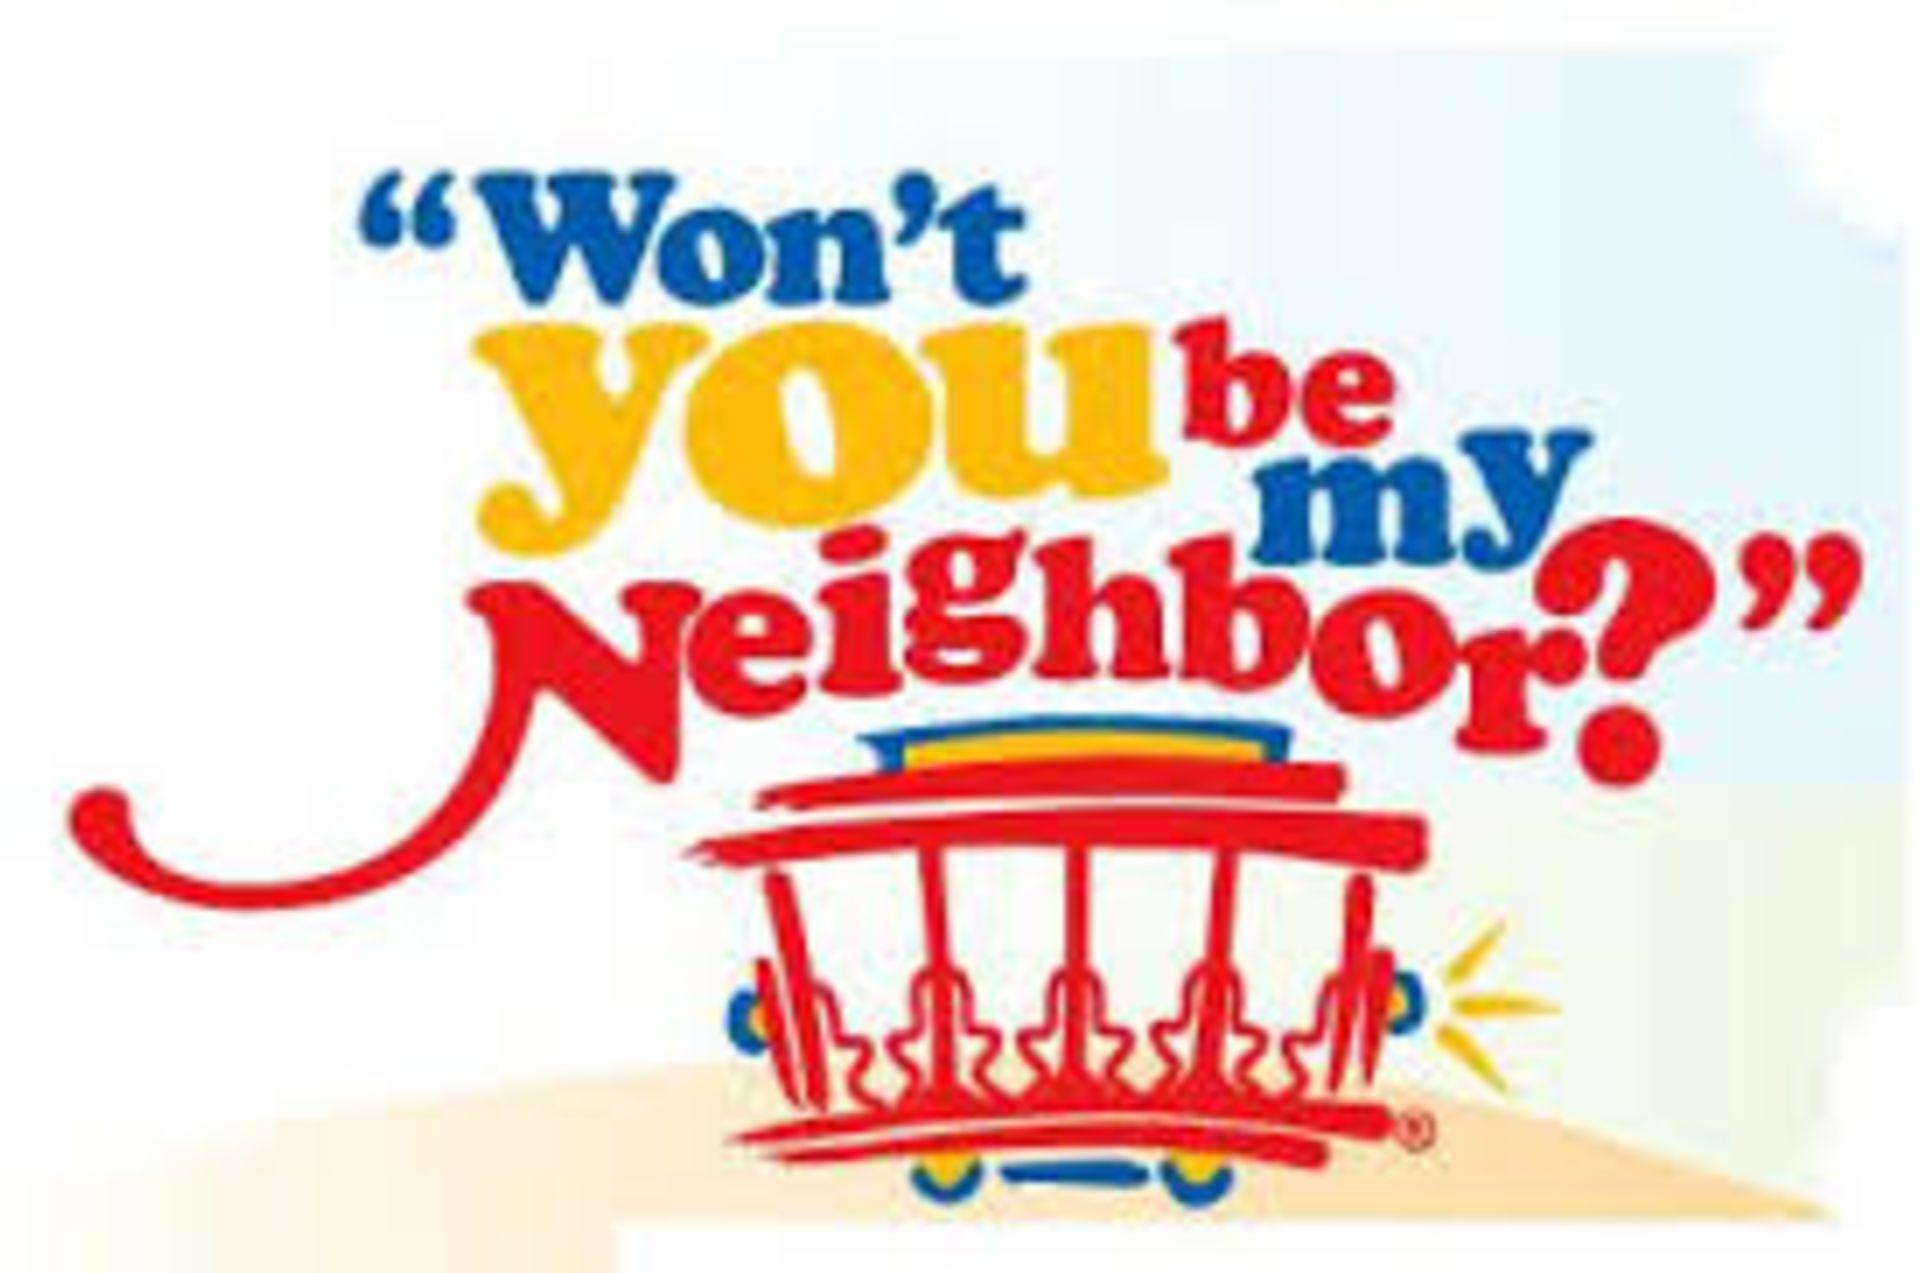 10 Top Traits Of Good Neighbors